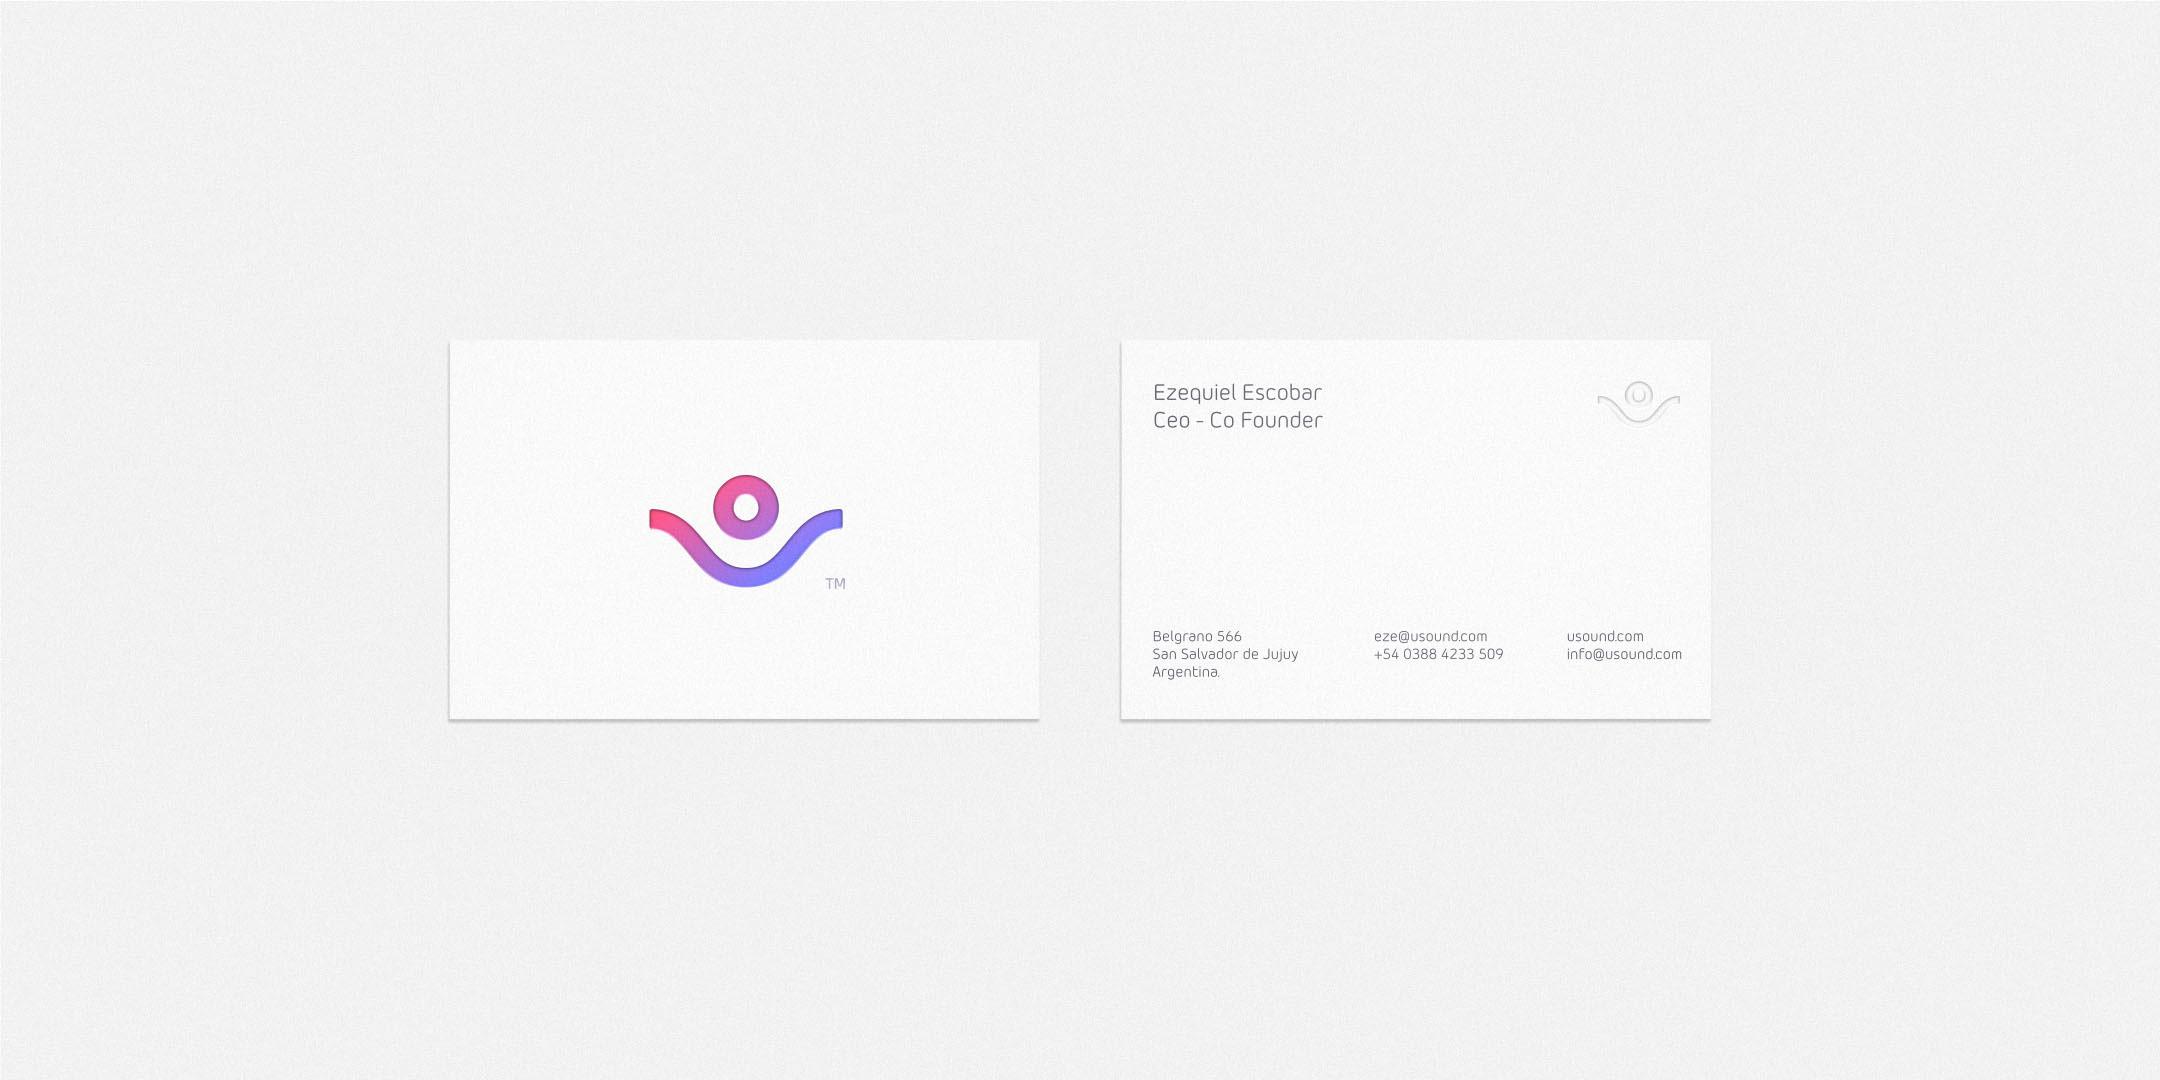 uSound品牌视觉形象设计